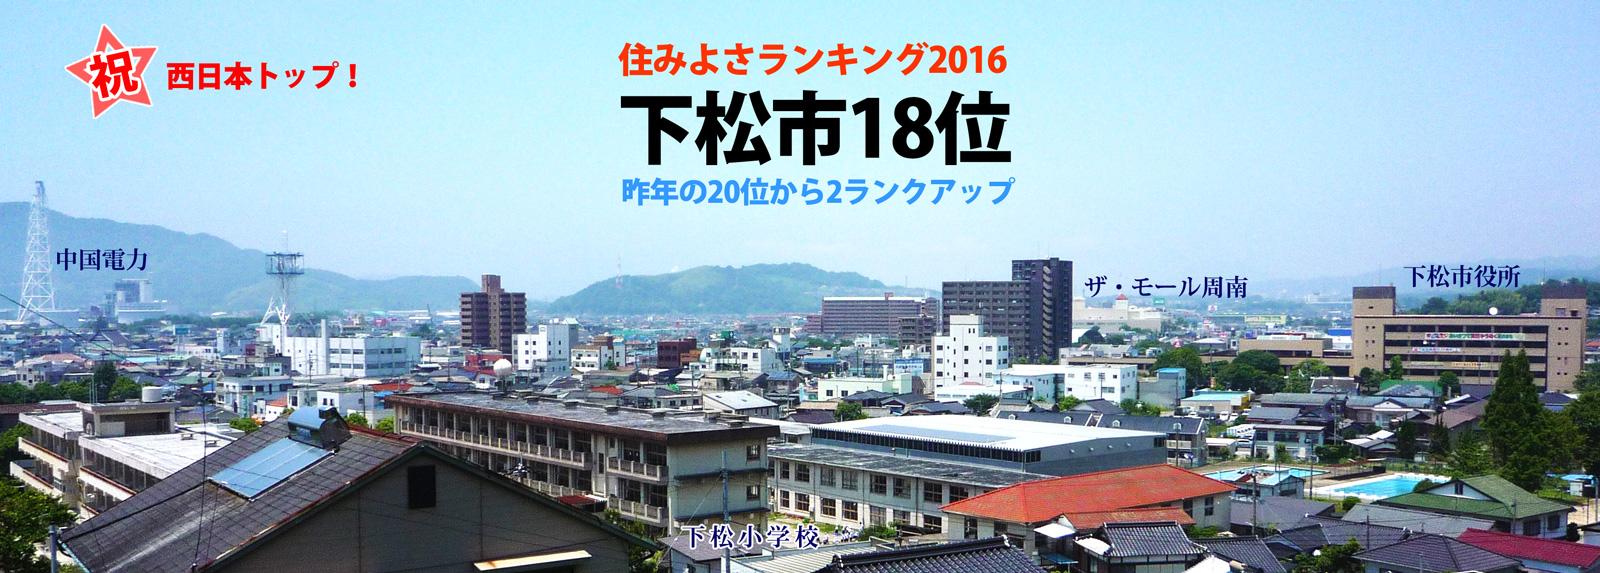 ���������������������������2016